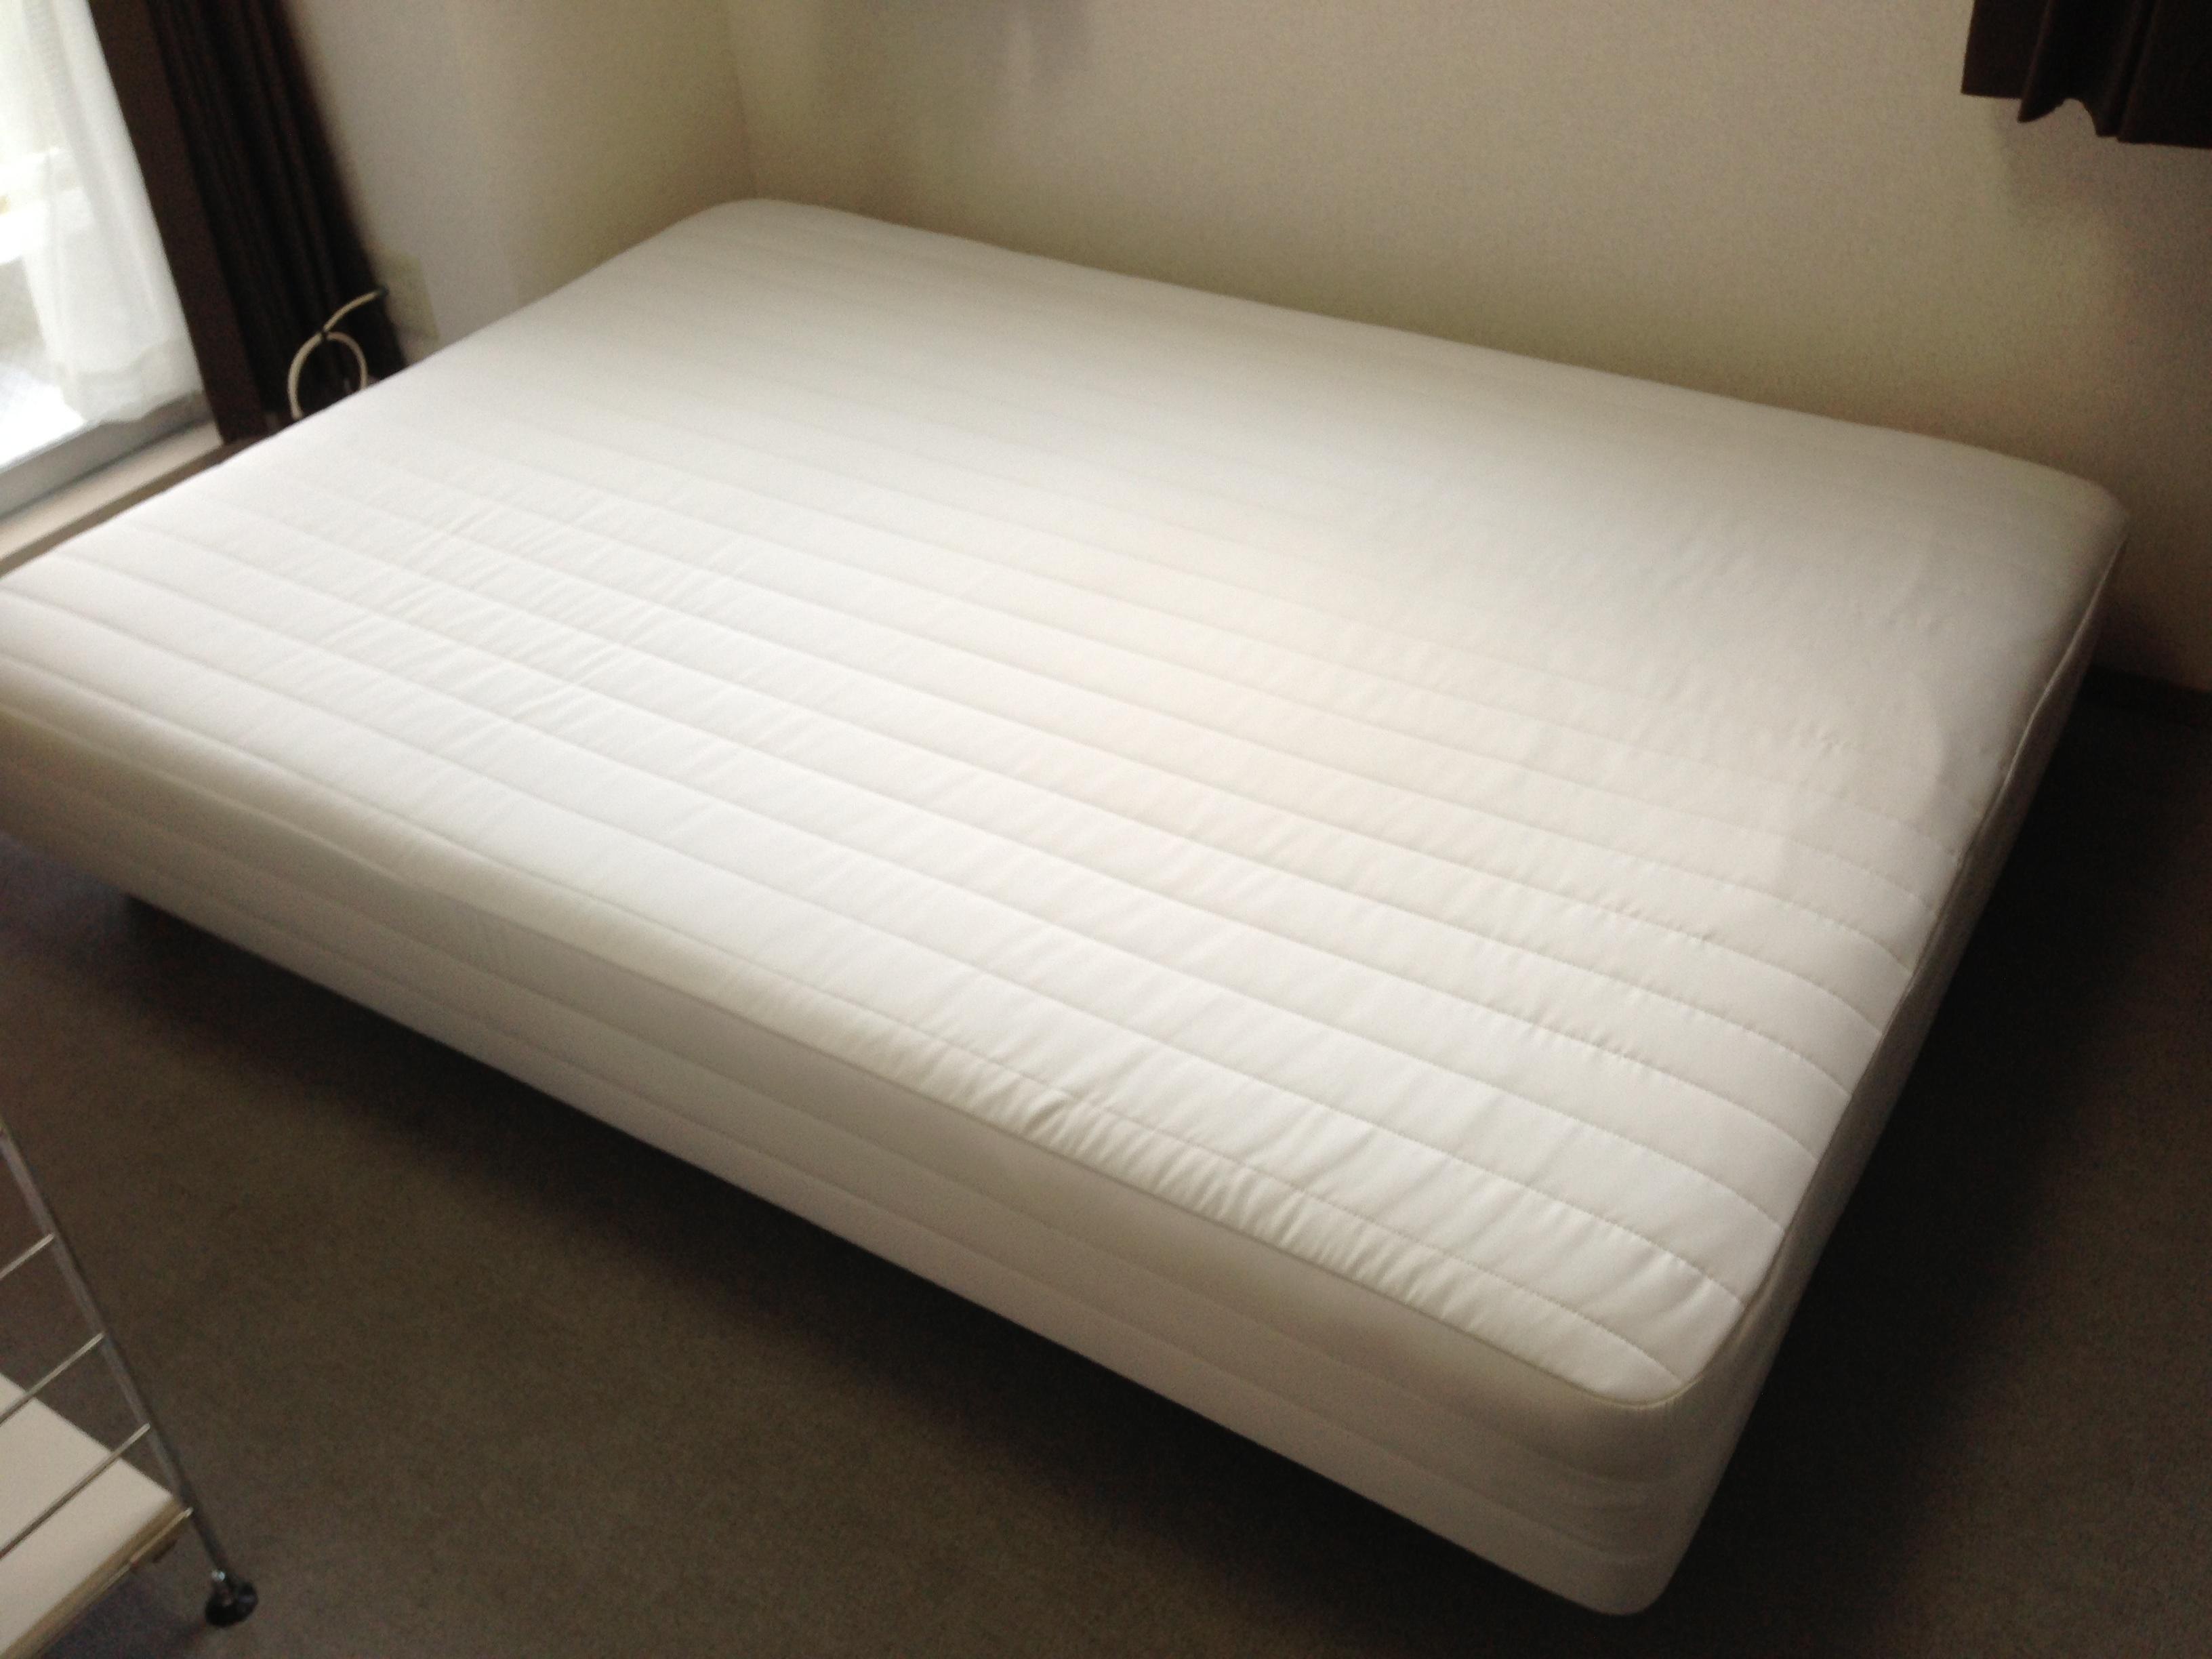 MUJI 無印良品 脚付きマットレス セミダブル ベッドパッド付き